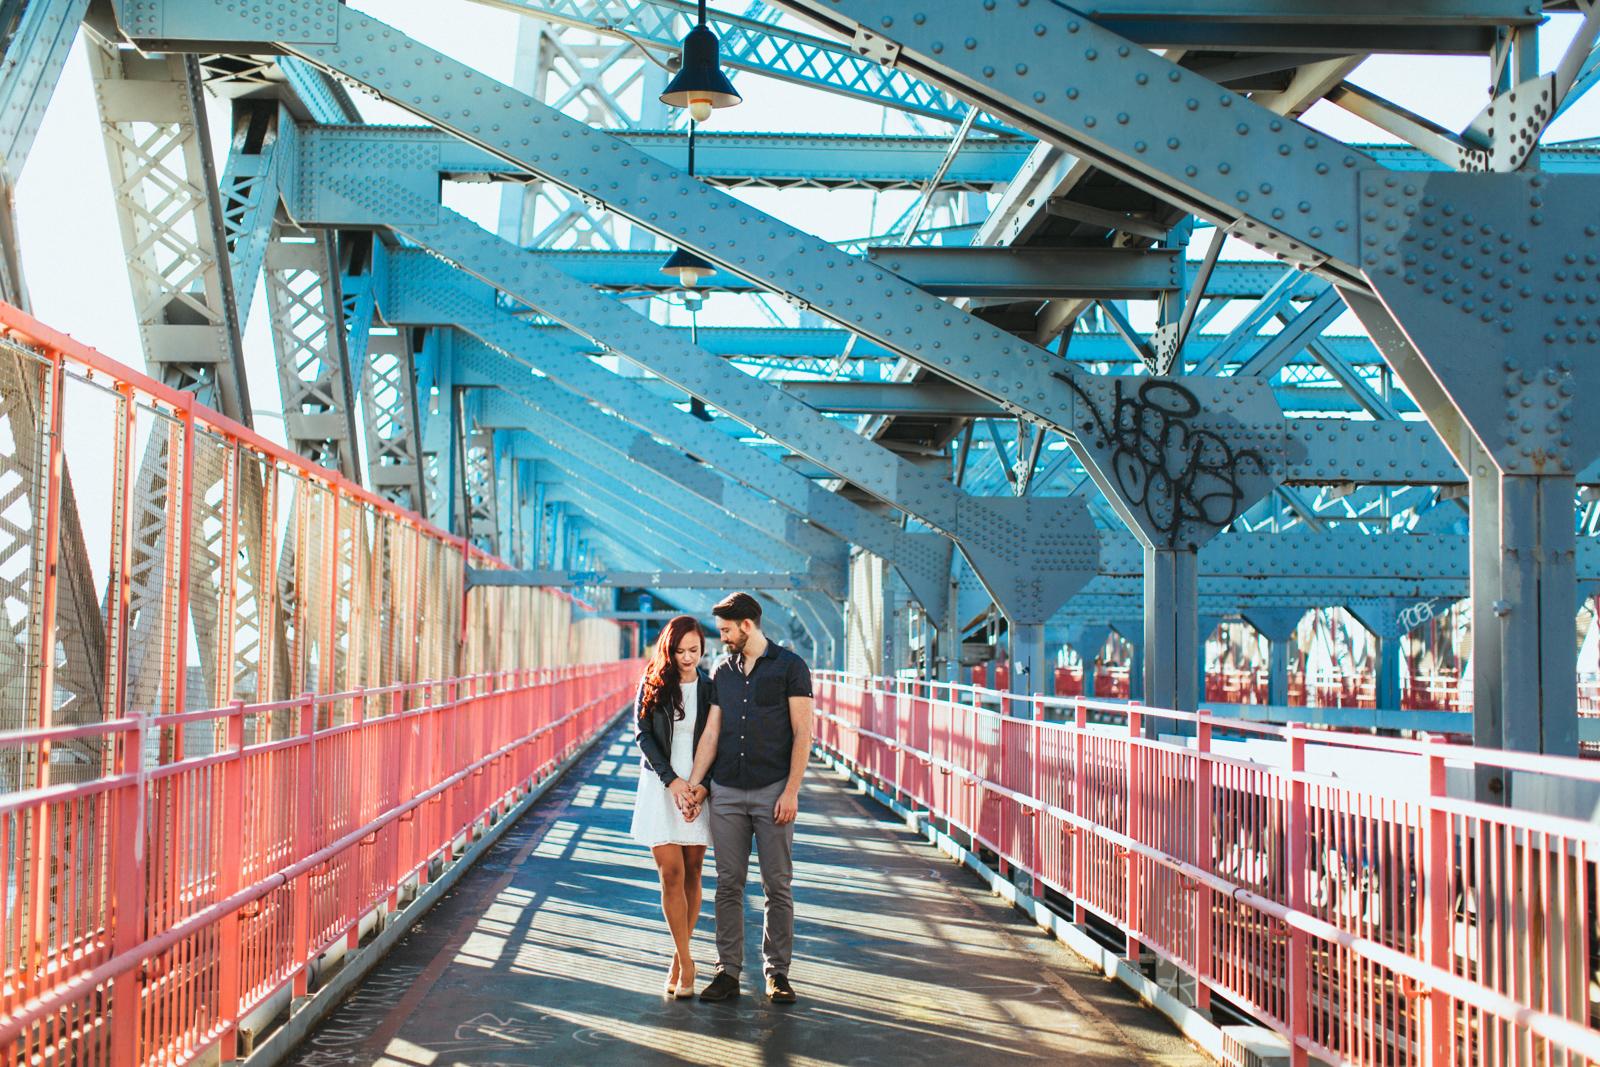 Brooklyn Greenpoint Williamsburg Bridge Engagement New York Wedding Photographer Boris Zaretsky _B2C9320.jpg